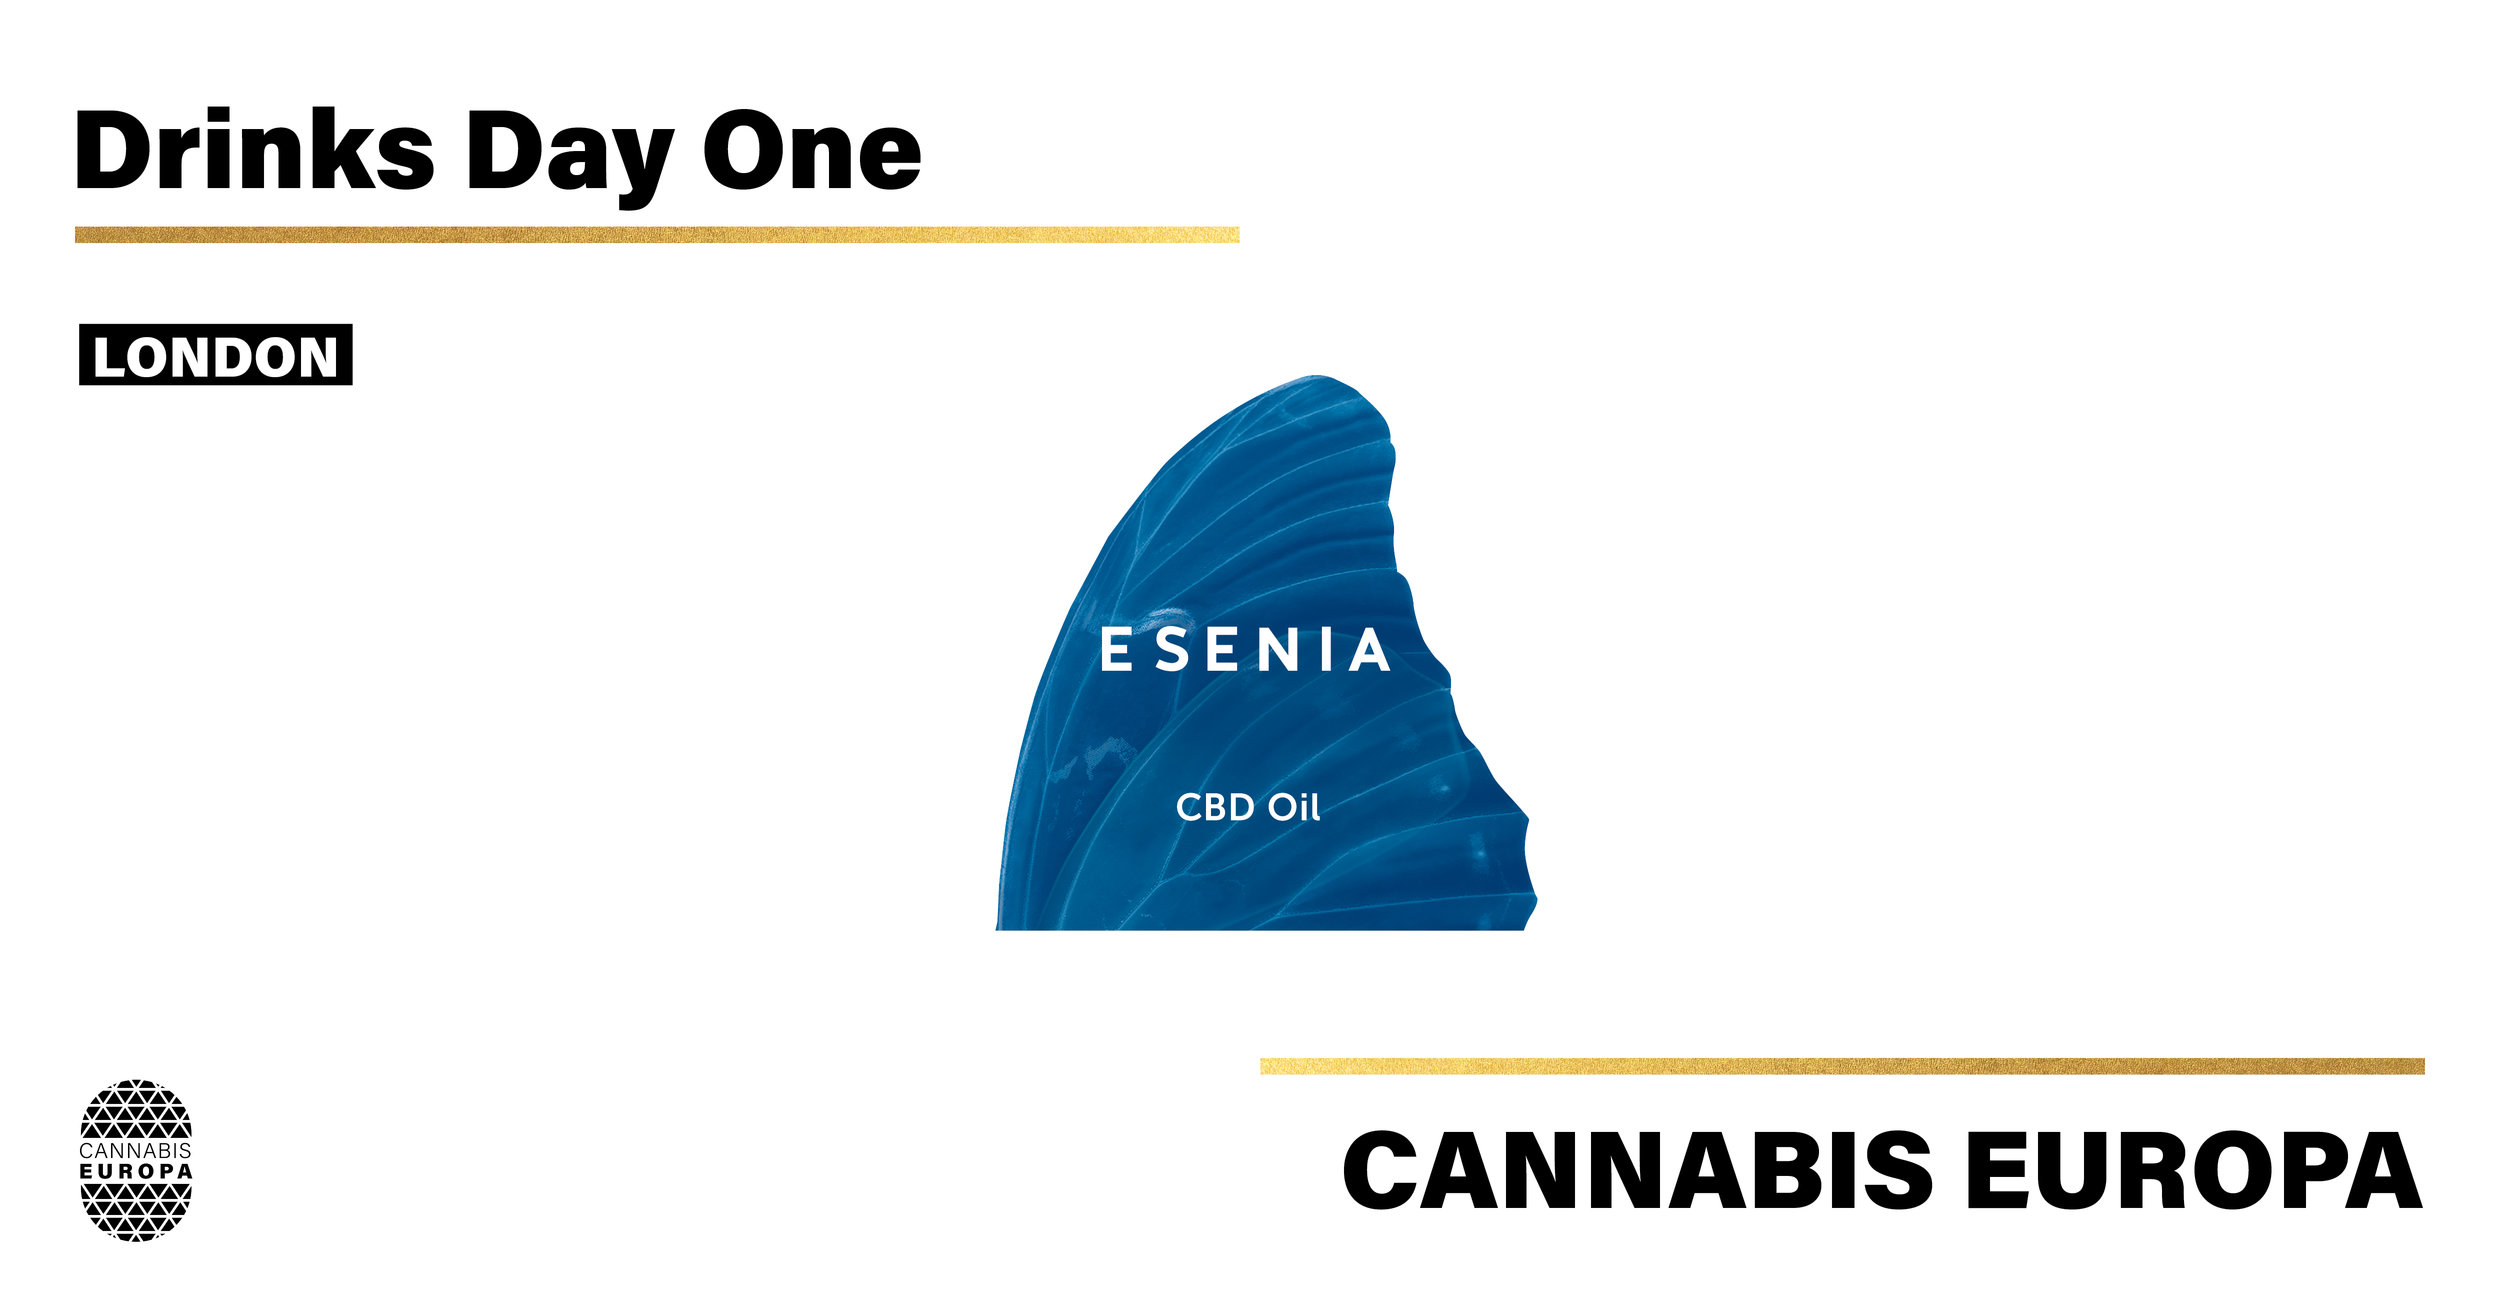 CE London - Partner Announcement Clever Leaves (Esenia) - FB.jpg